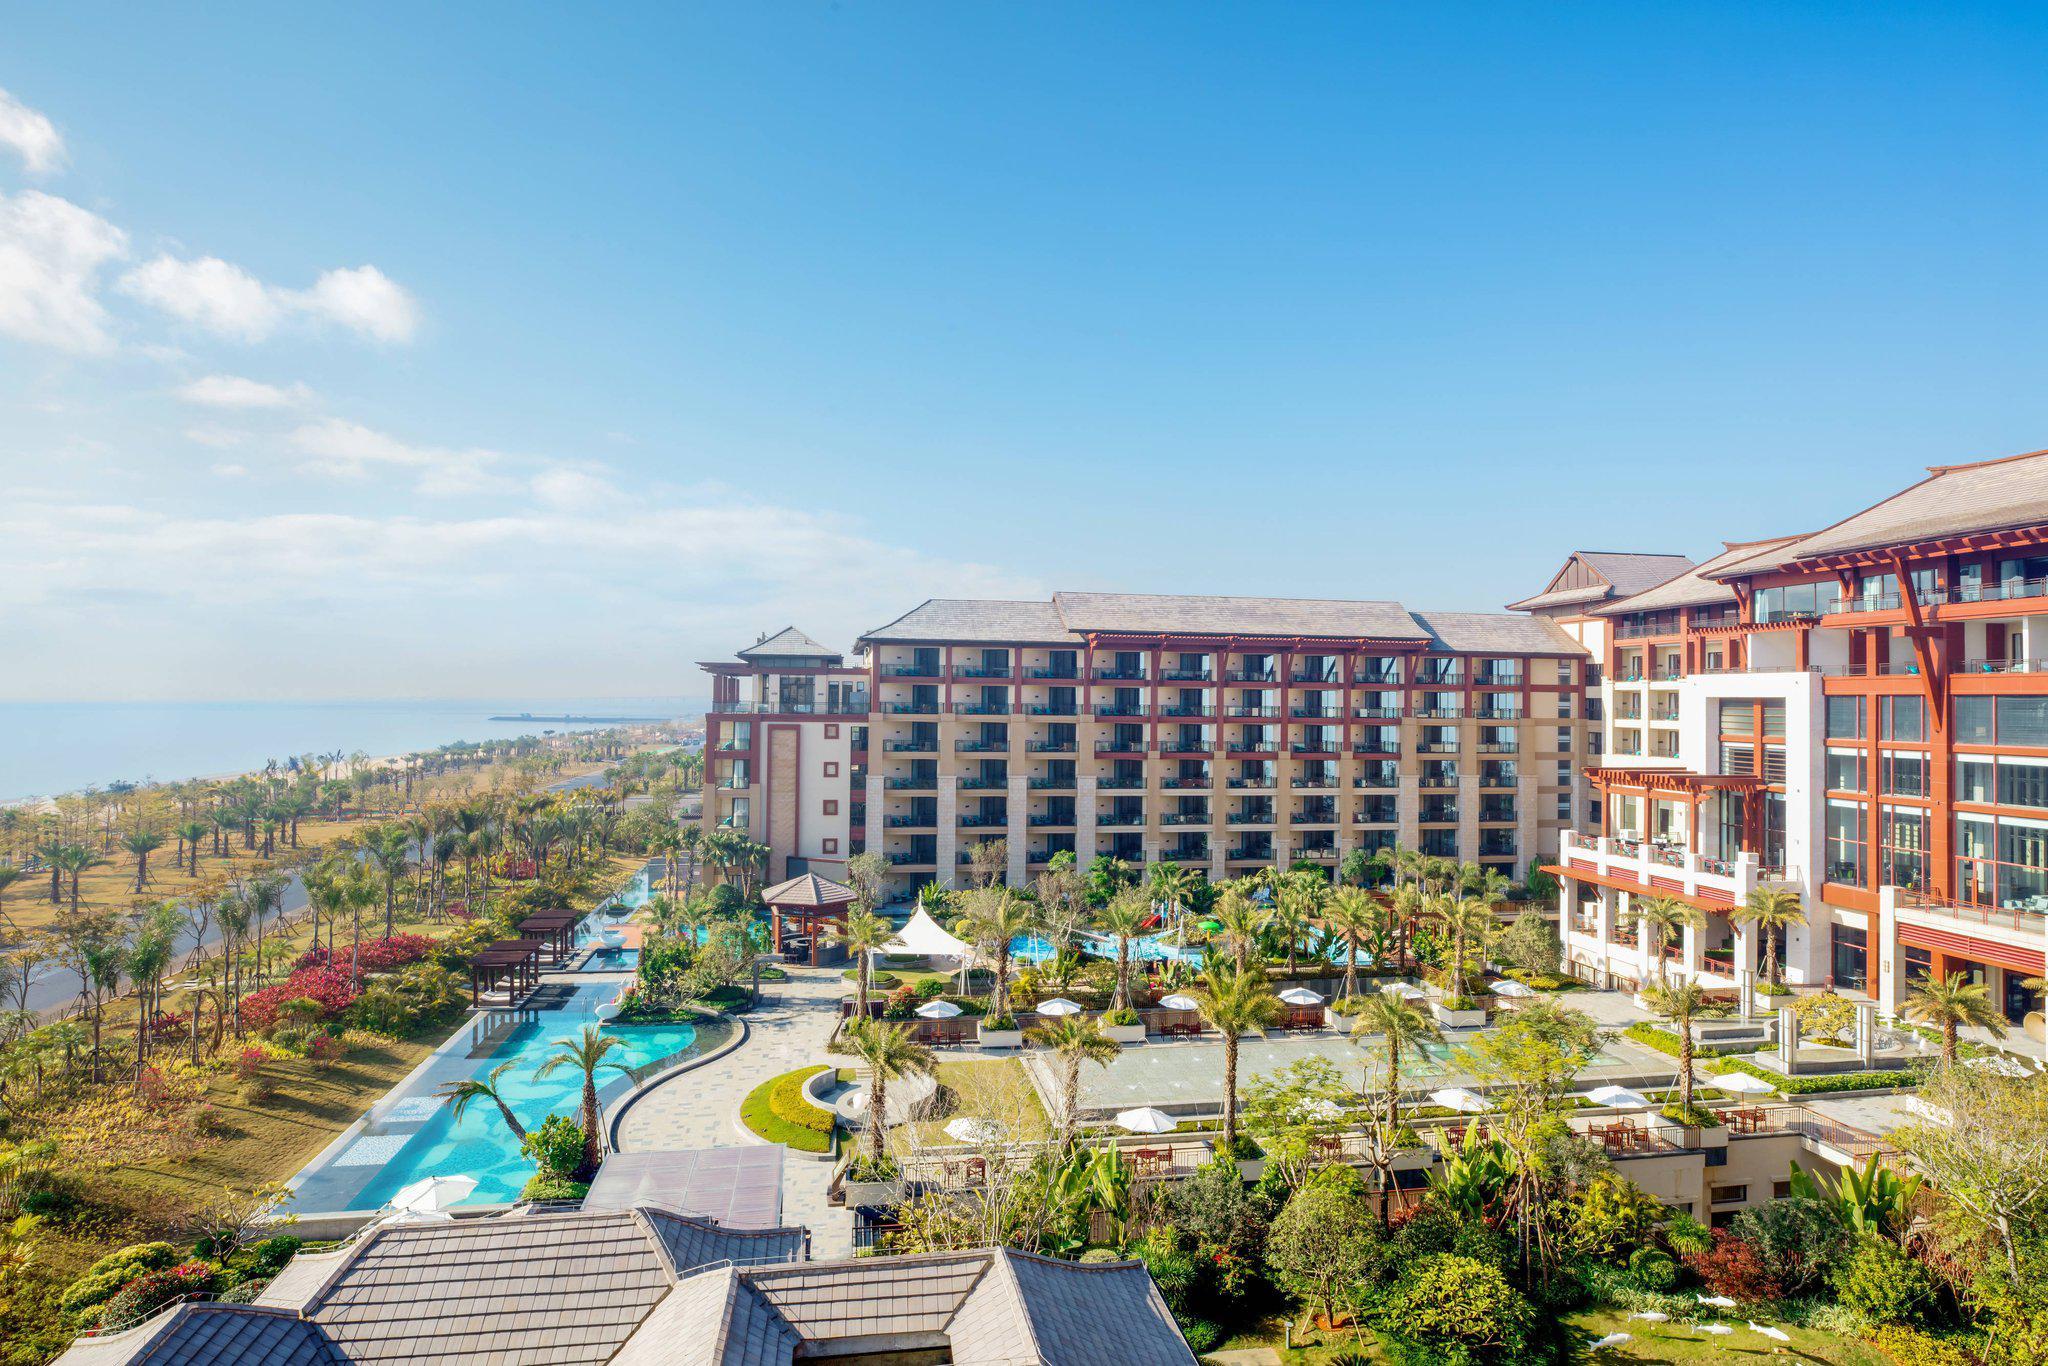 Xiamen Marriott Hotel & Conference Centre